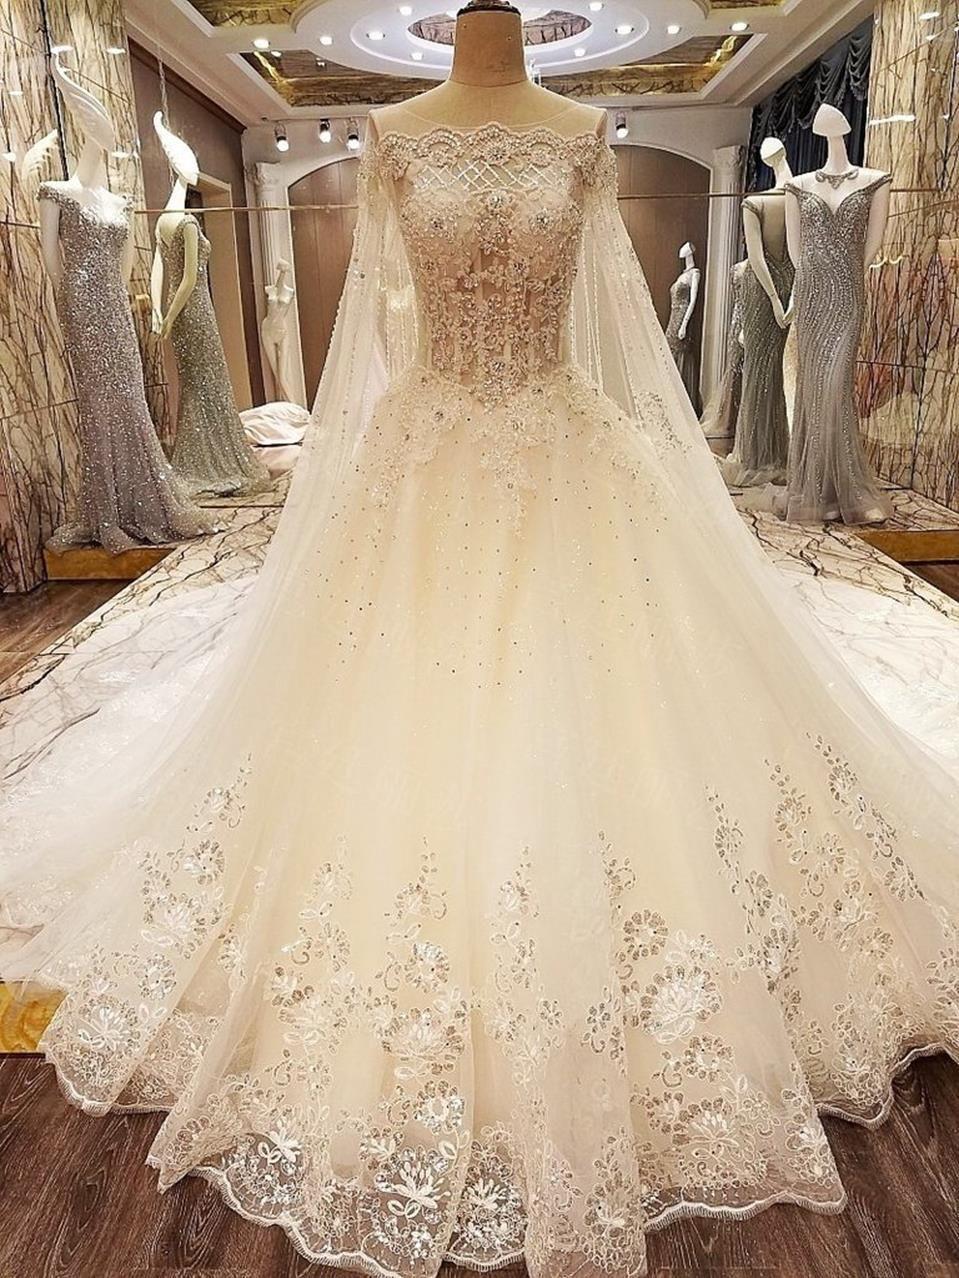 Plus Size Wedding Dress Ornate Elegant Bridal Gowns With Cathedral Train Long Train Wedding Dress Wedding Dress Train Long Wedding Dresses